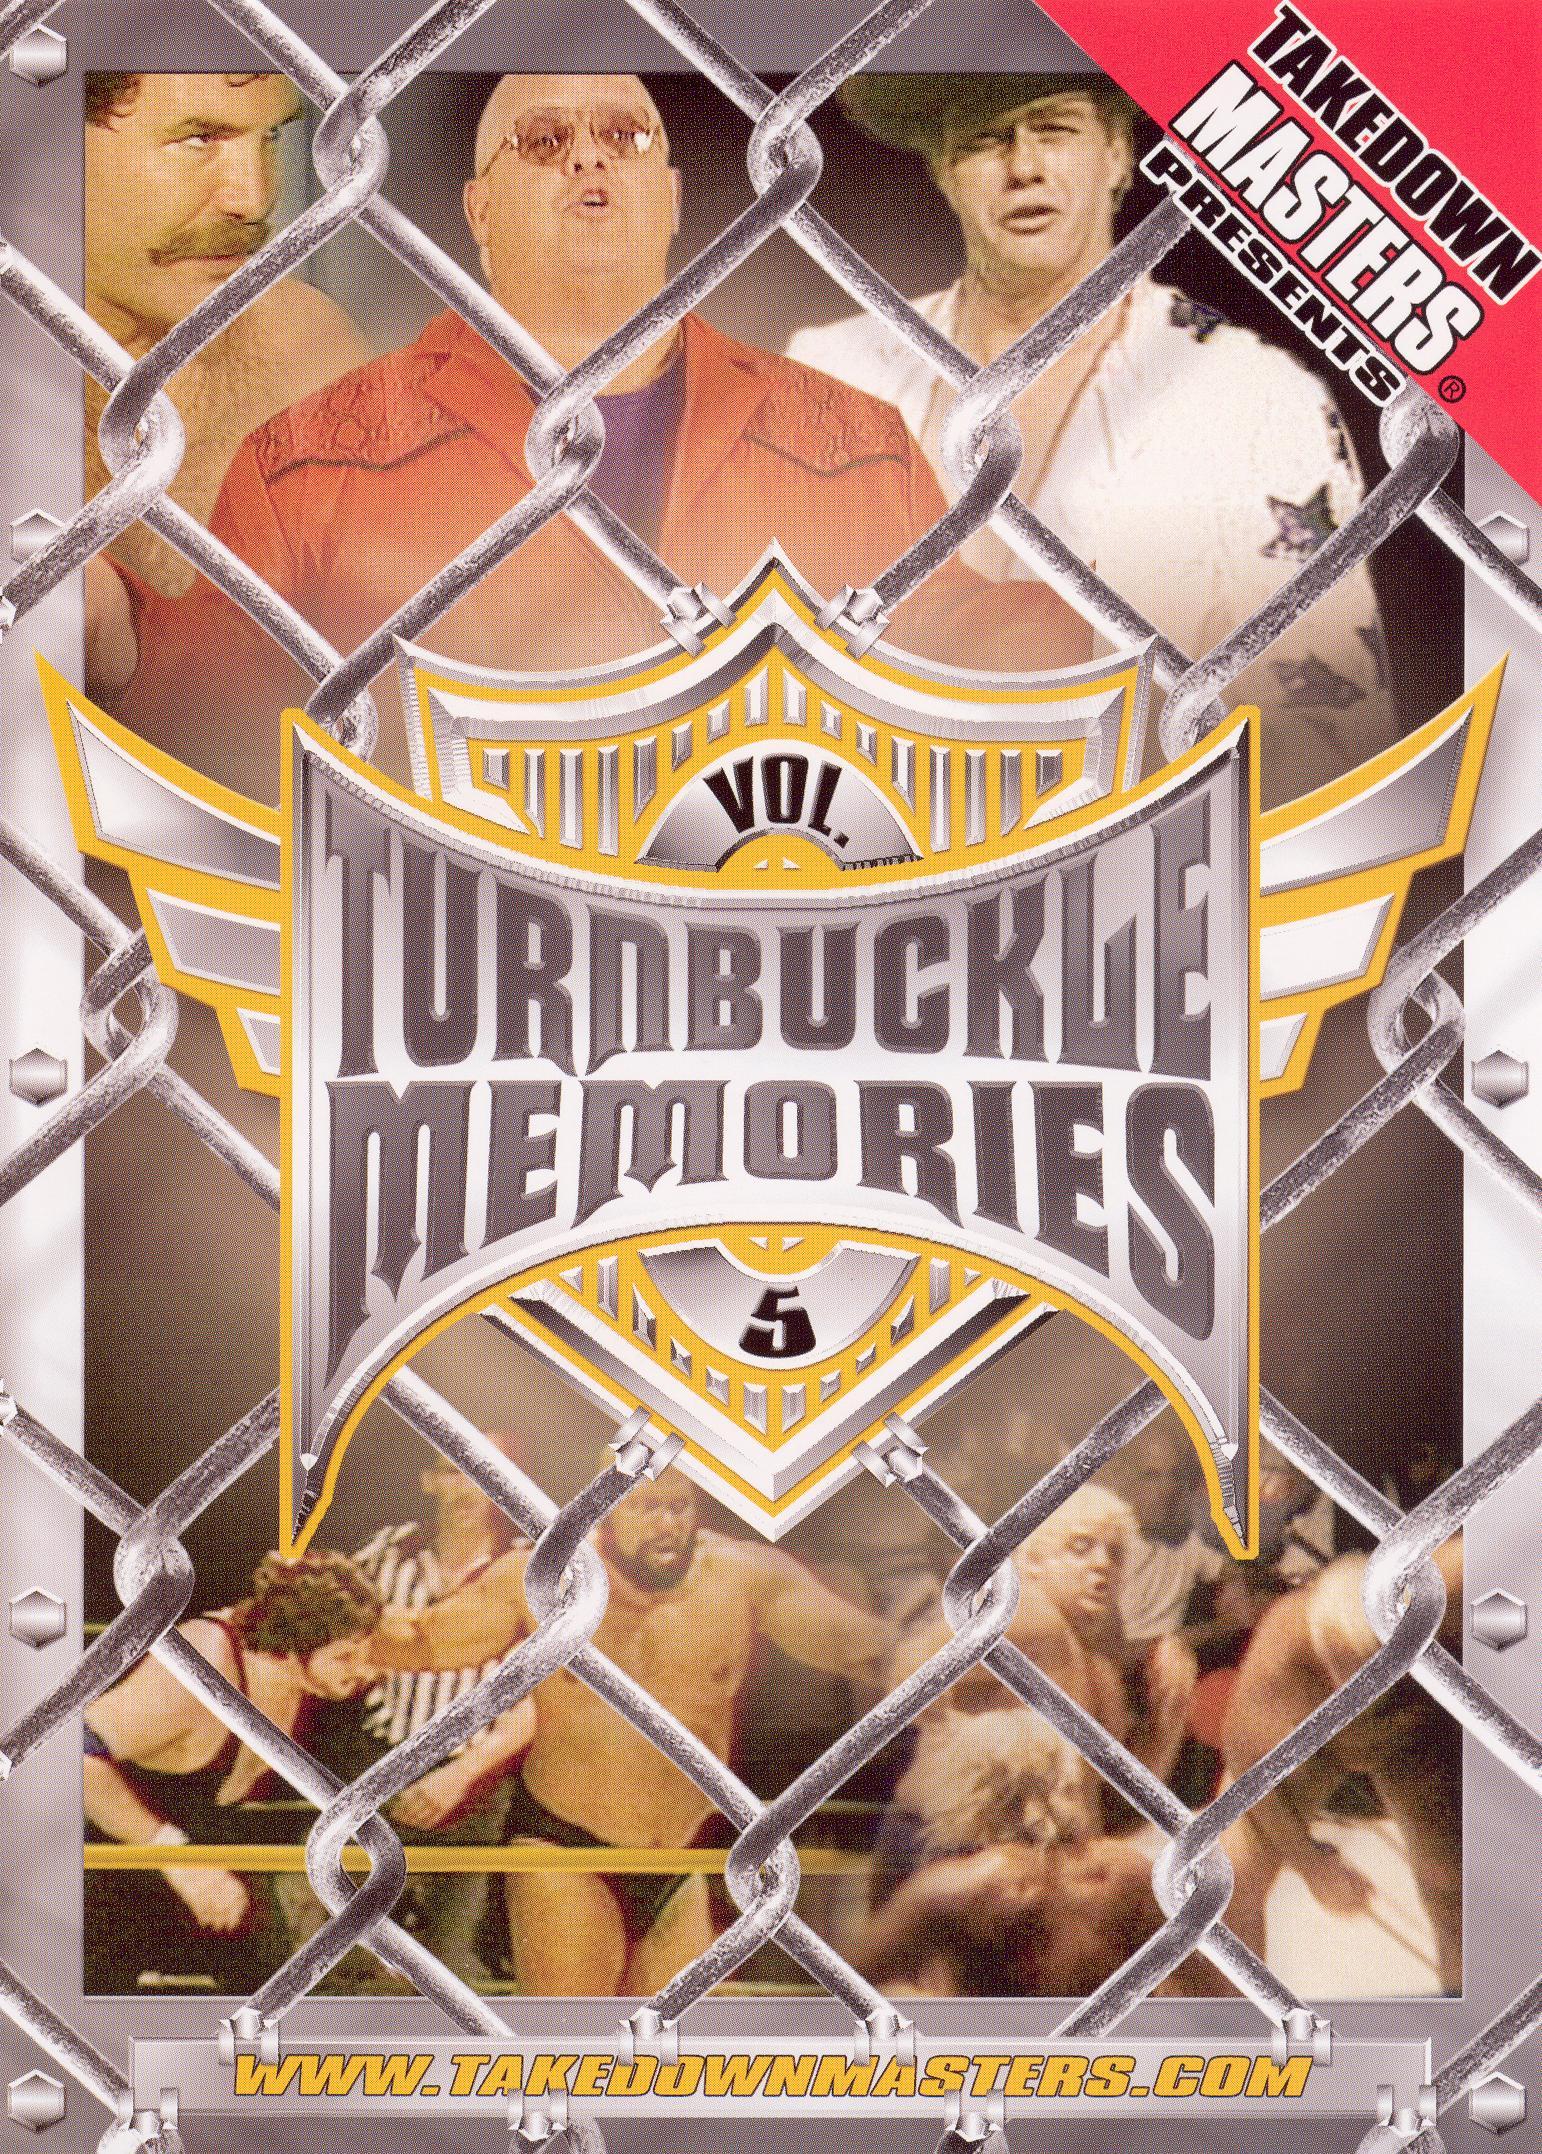 Takedown Masters: Turnbuckle Memories, Vol. 5